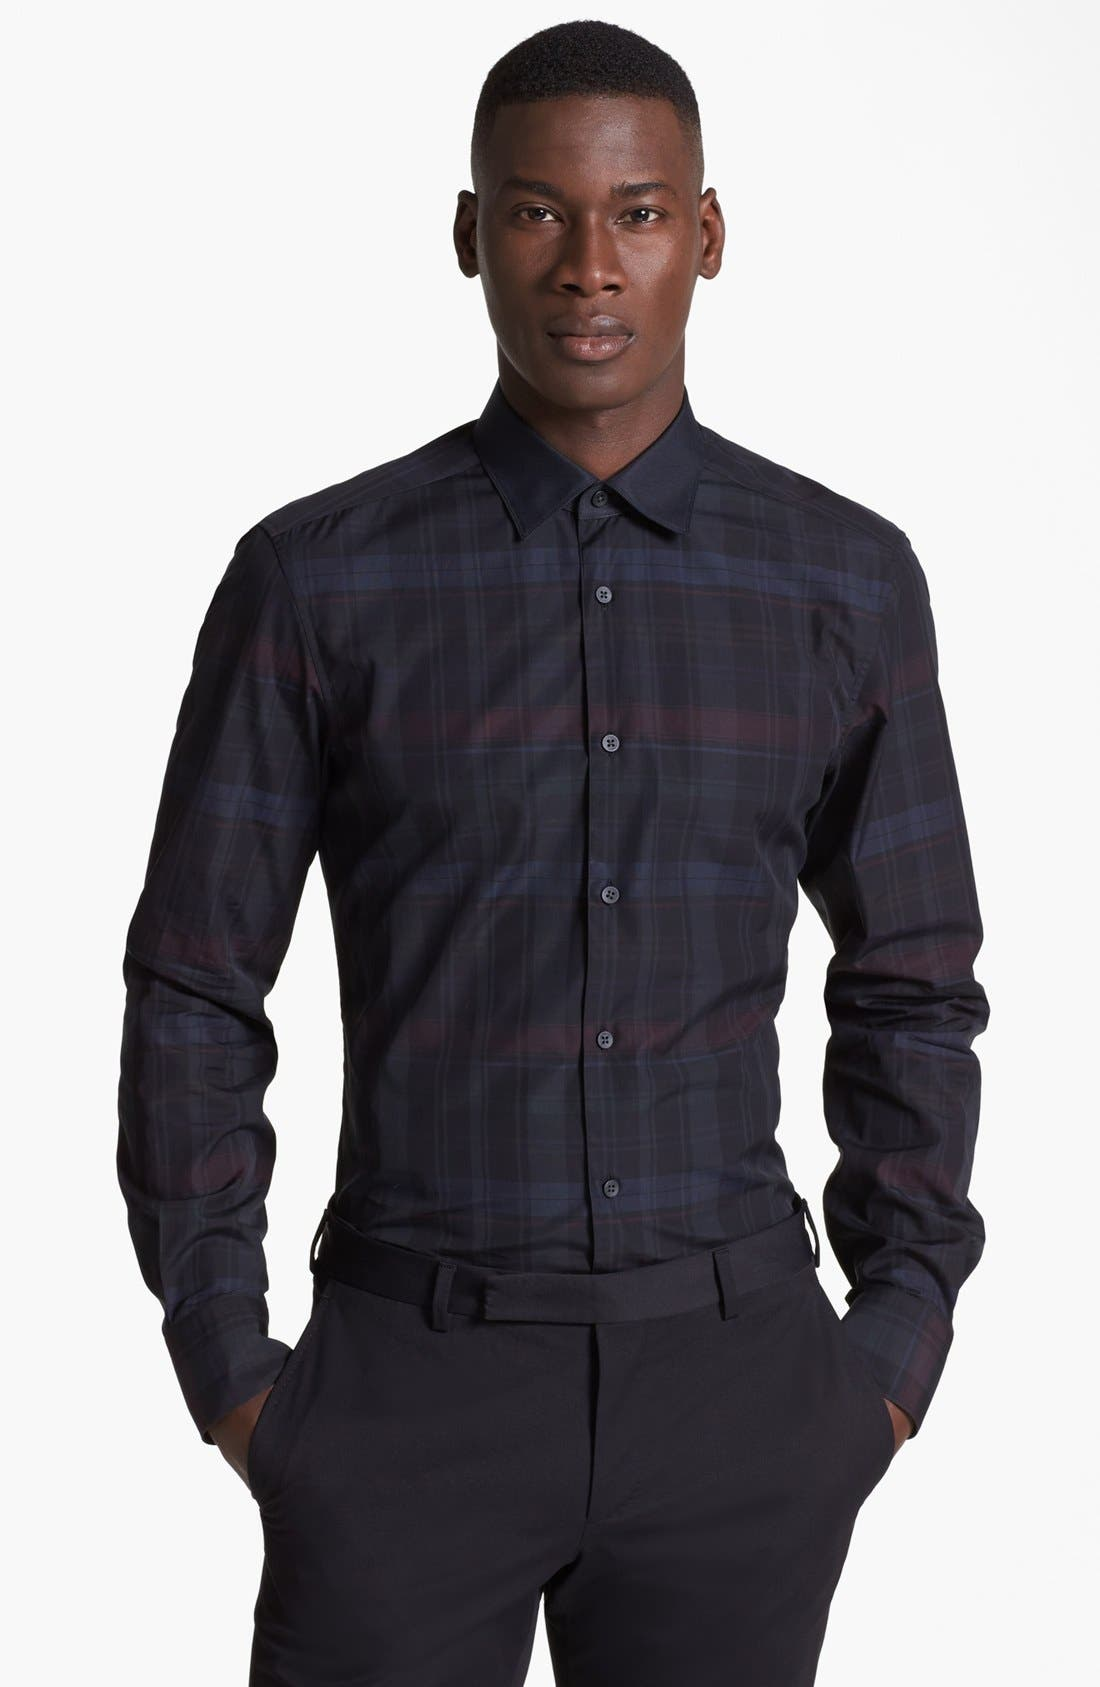 Alternate Image 1 Selected - Z Zegna Plaid Check Woven Shirt